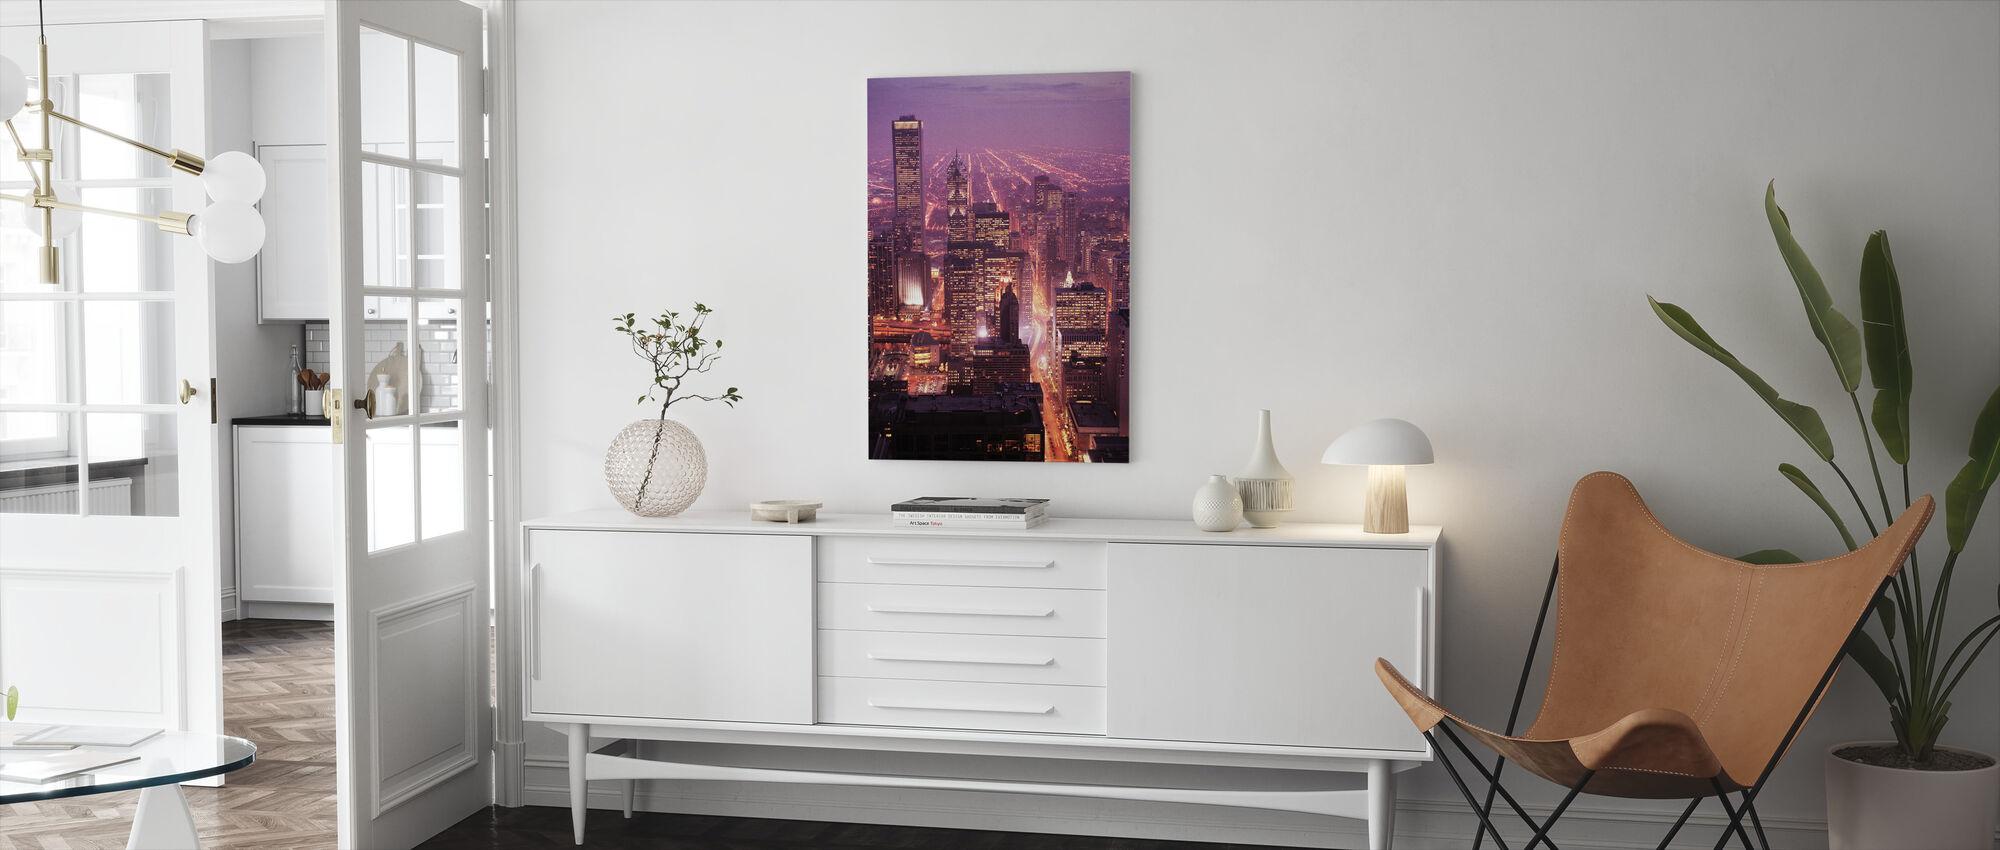 Violainen Chicago - Canvastaulu - Olohuone